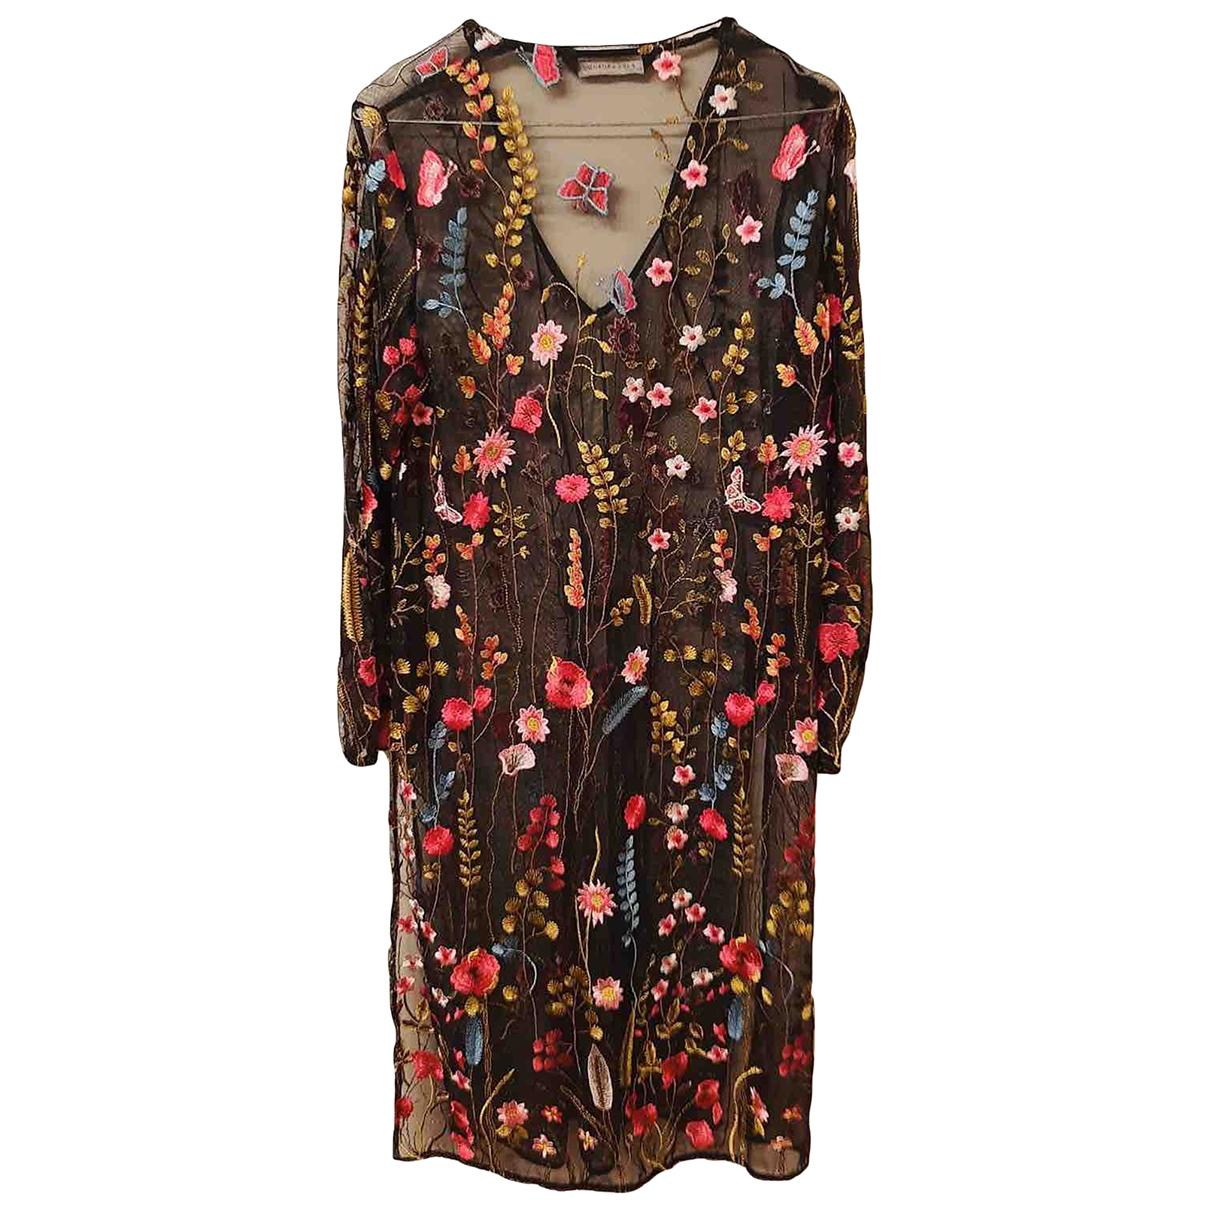 Zara \N Kleid in  Bunt Polyester